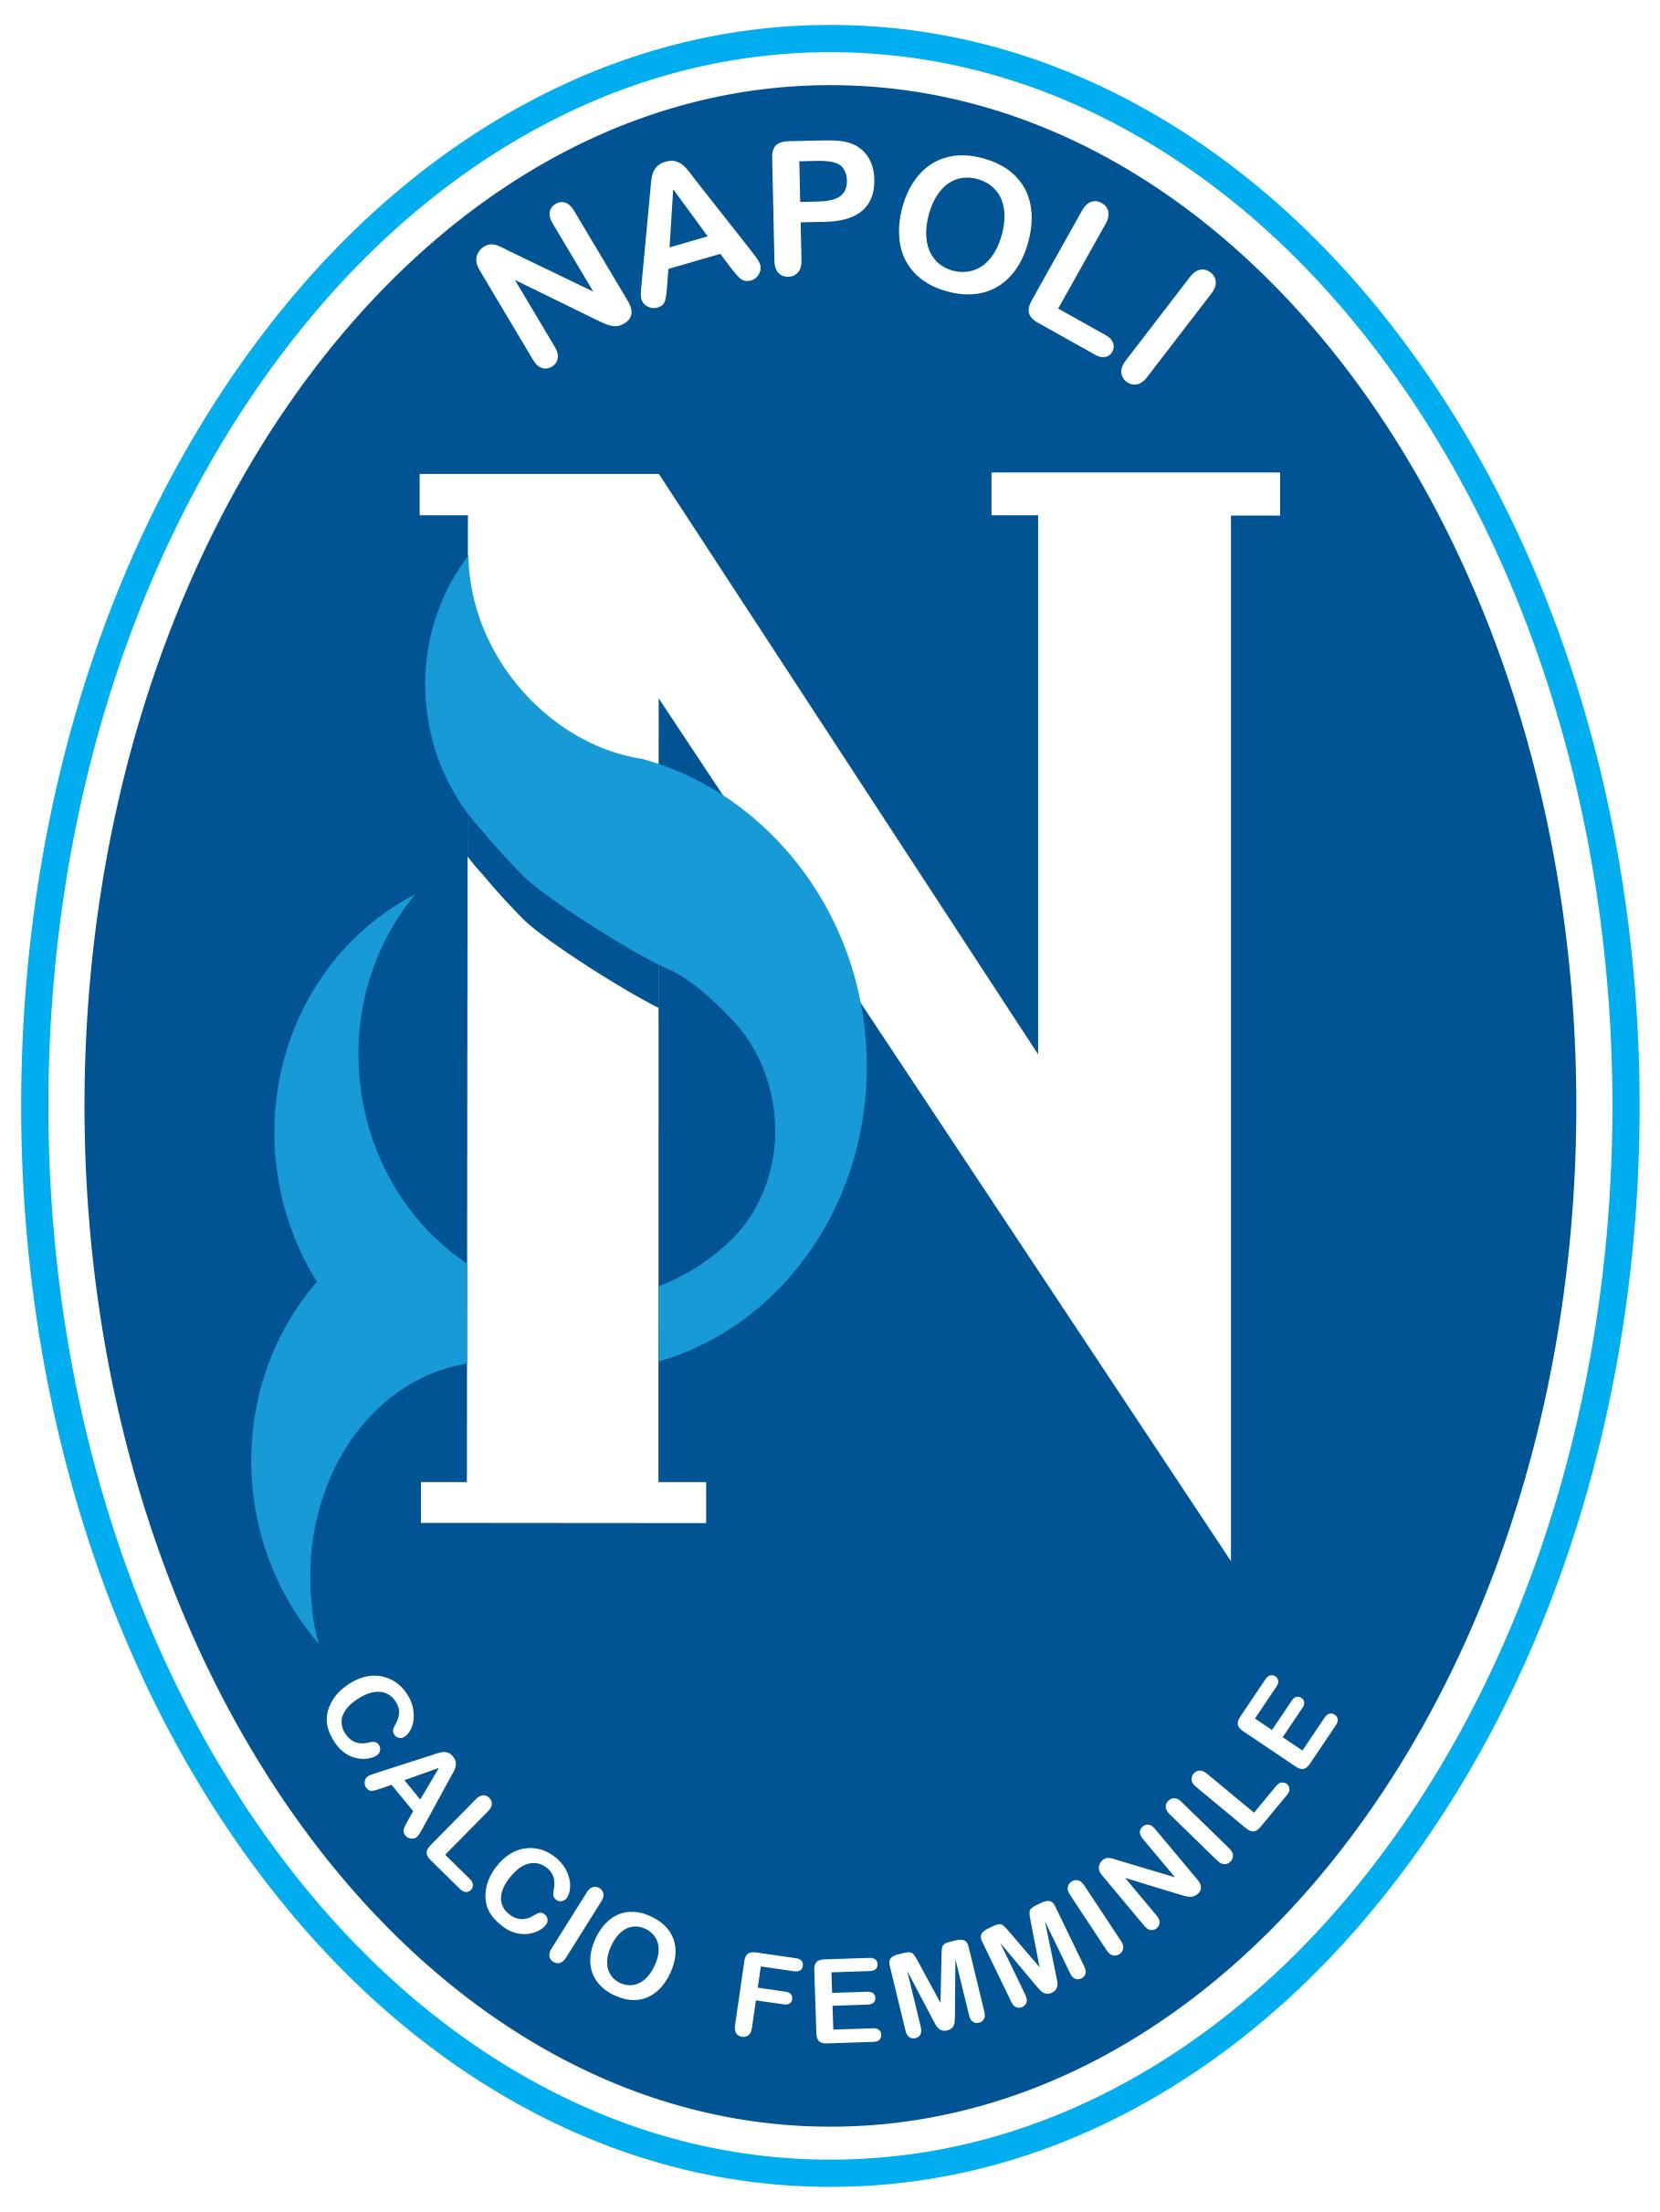 S S D Napoli Femminile Wikipedia